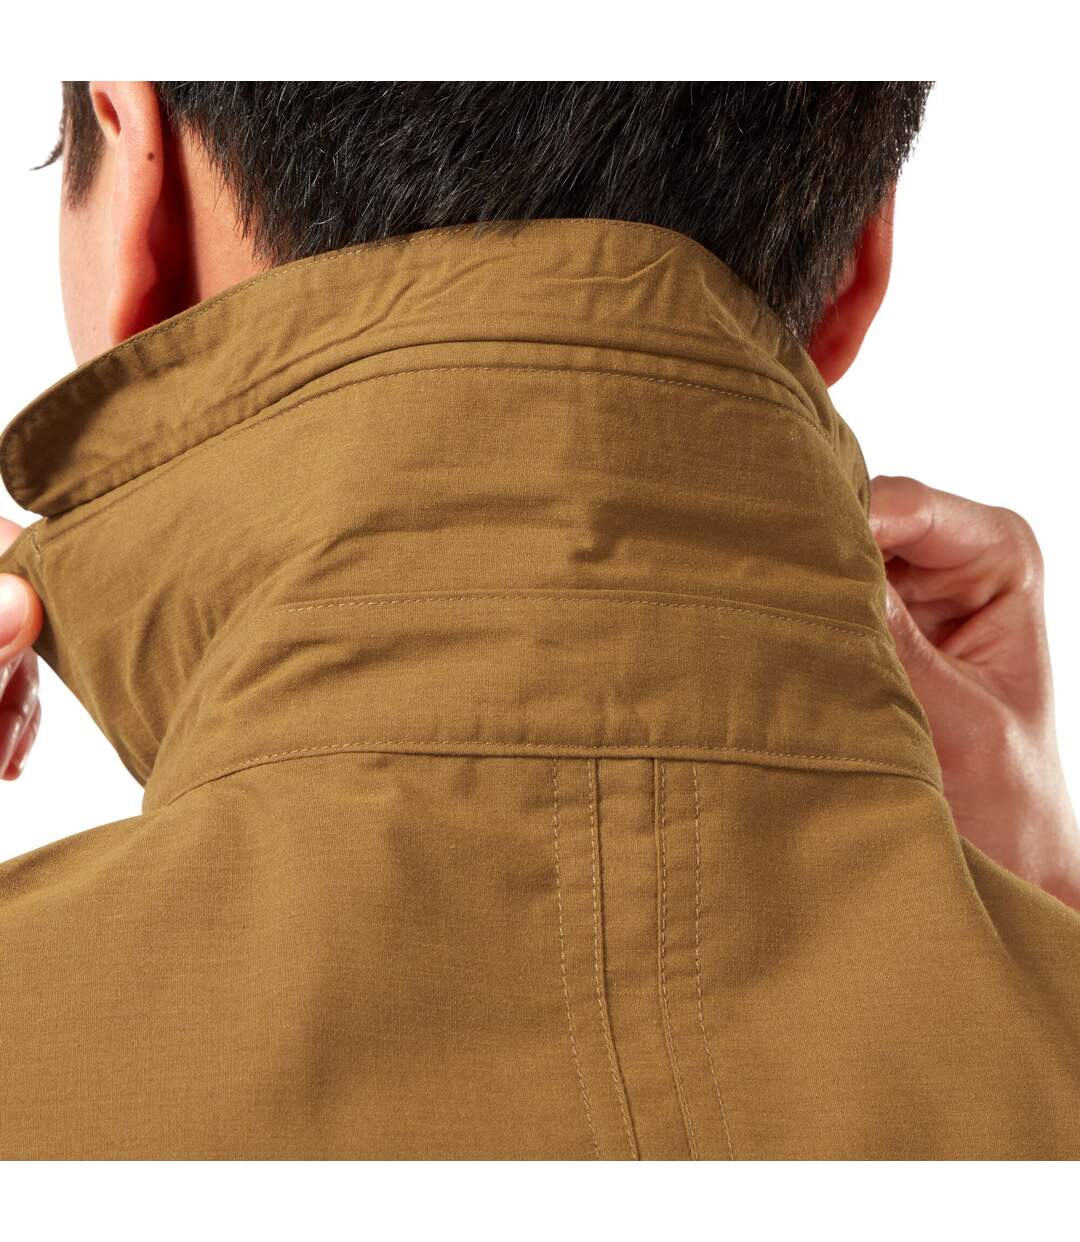 Craghoppers Mens Kiwi Short-Sleeved Shirt (Rubber Brown) - UTCG1606